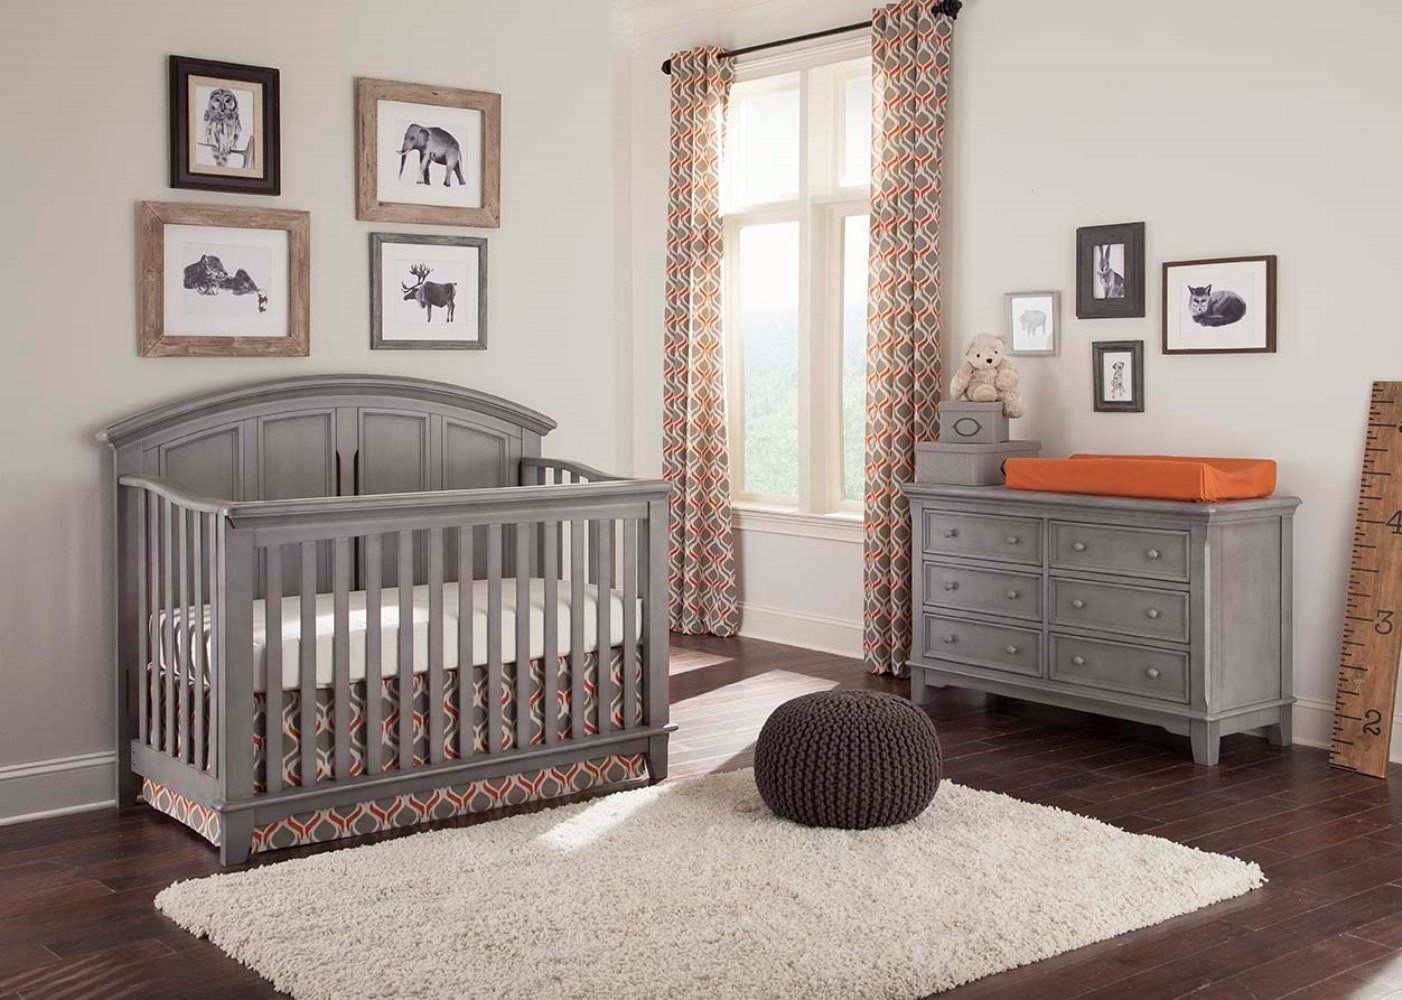 westwood design jonesport 4 in 1 convertible crib cloud baby baby room cribs. Black Bedroom Furniture Sets. Home Design Ideas